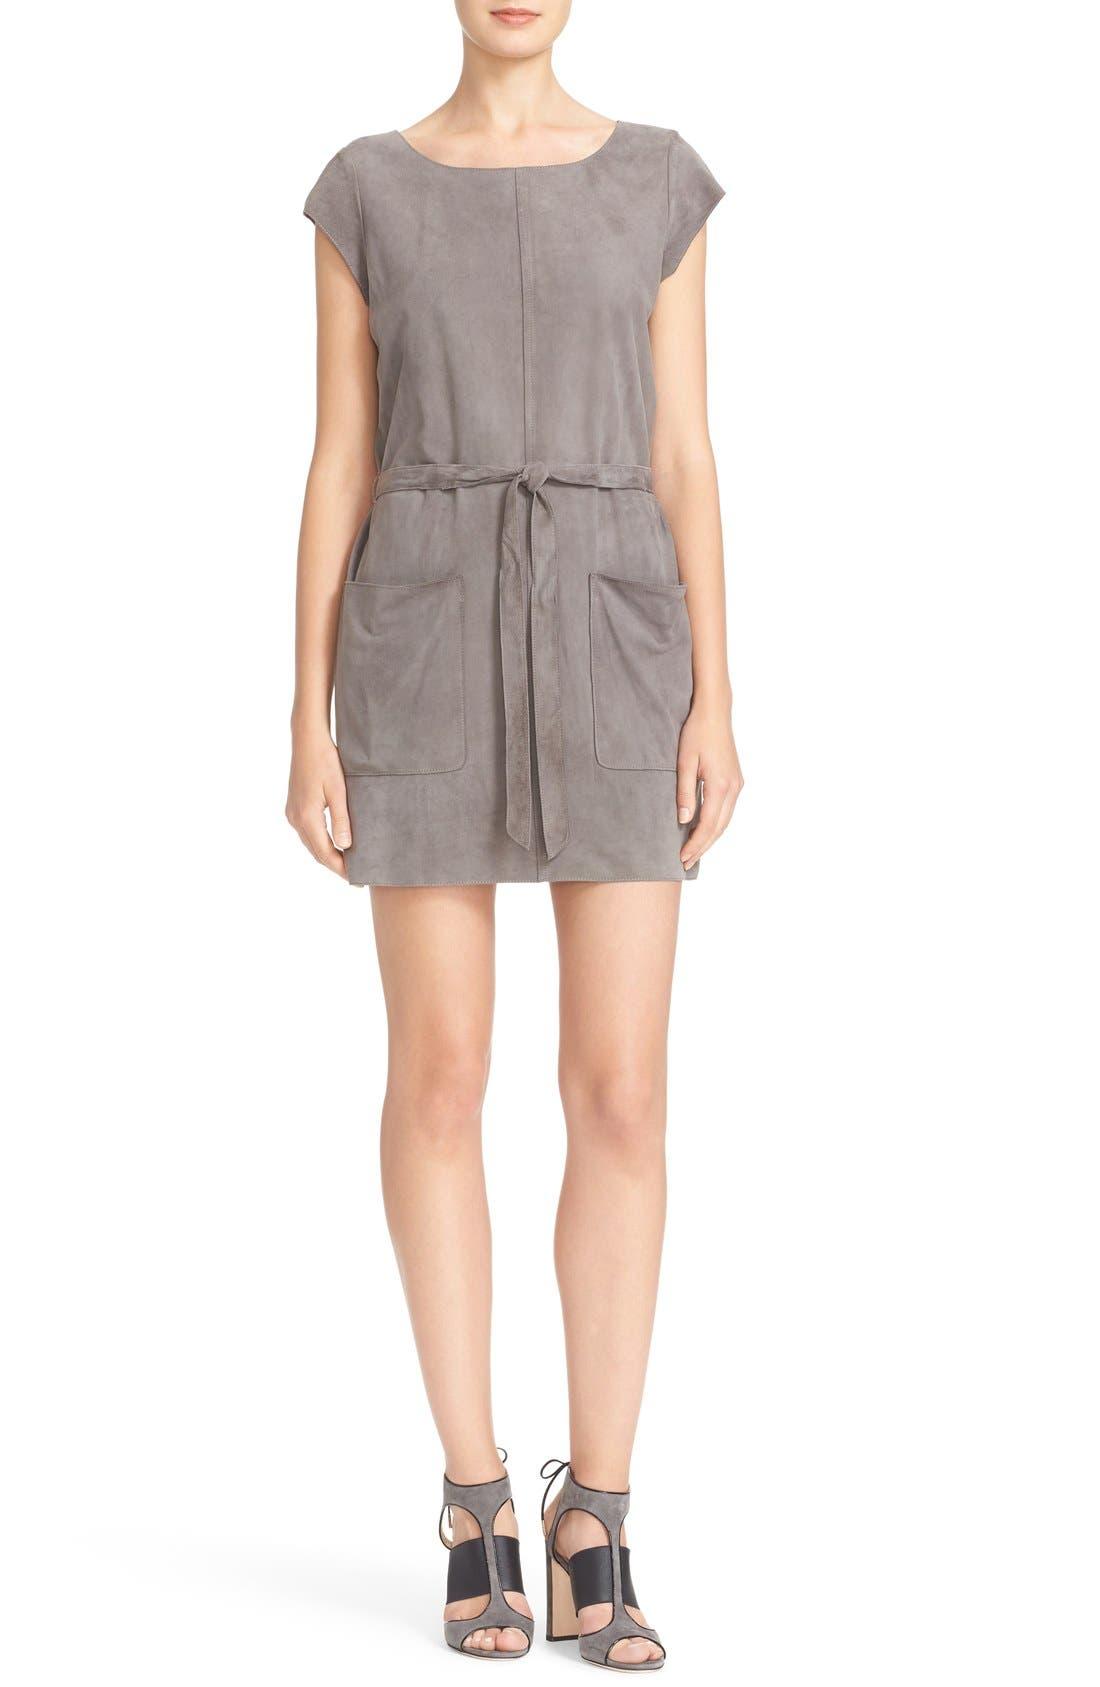 Alternate Image 1 Selected - Joie Maroone Belted Suede Minidress